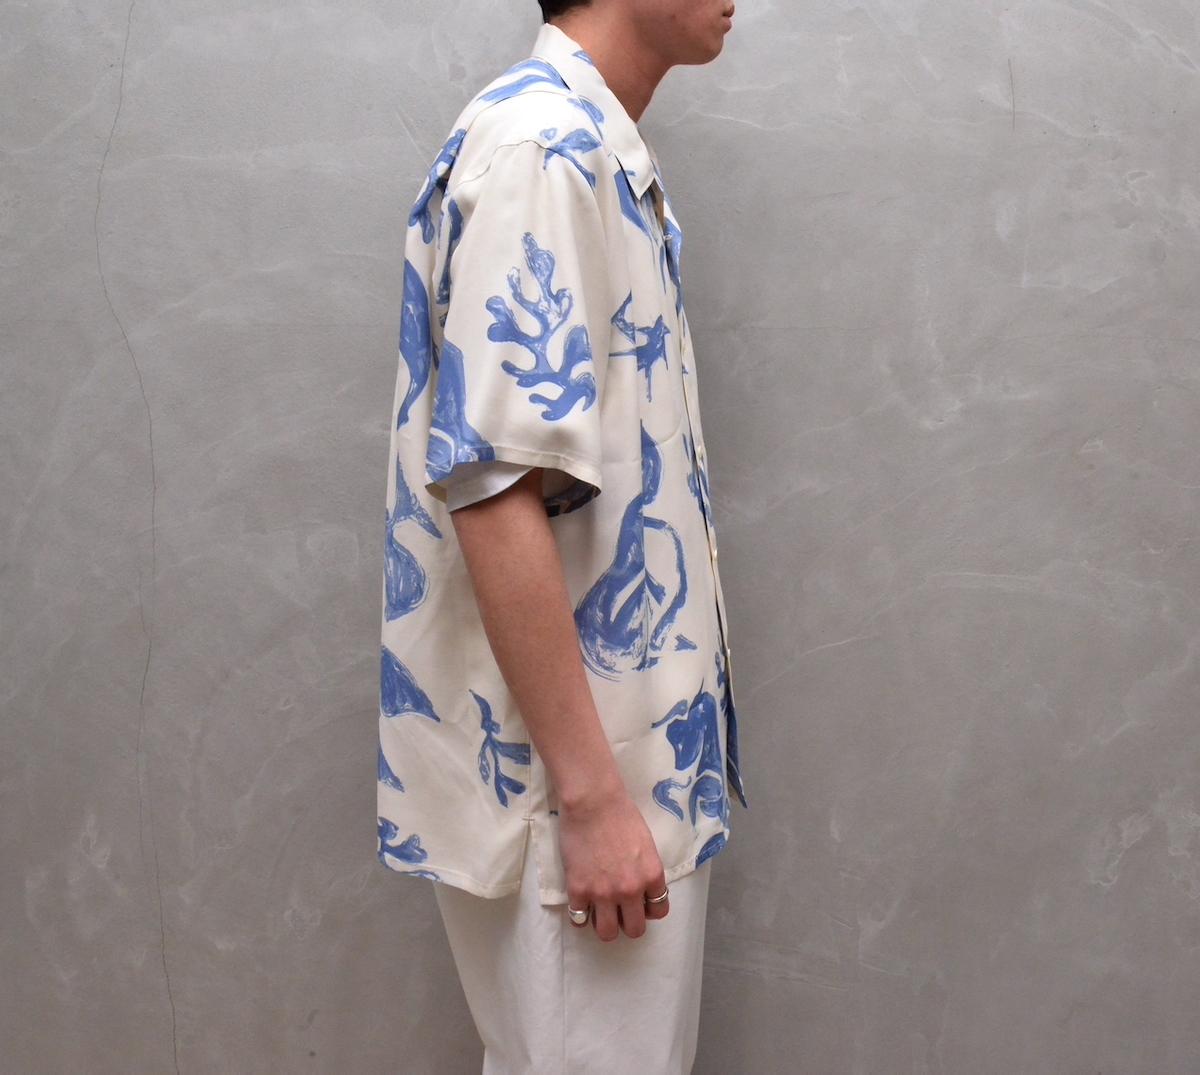 OLD JOE BRAND. 「 ORIGINAL PRINTED OPEN COLLAR SHIRTS (DRAWING) Short-sleeve」